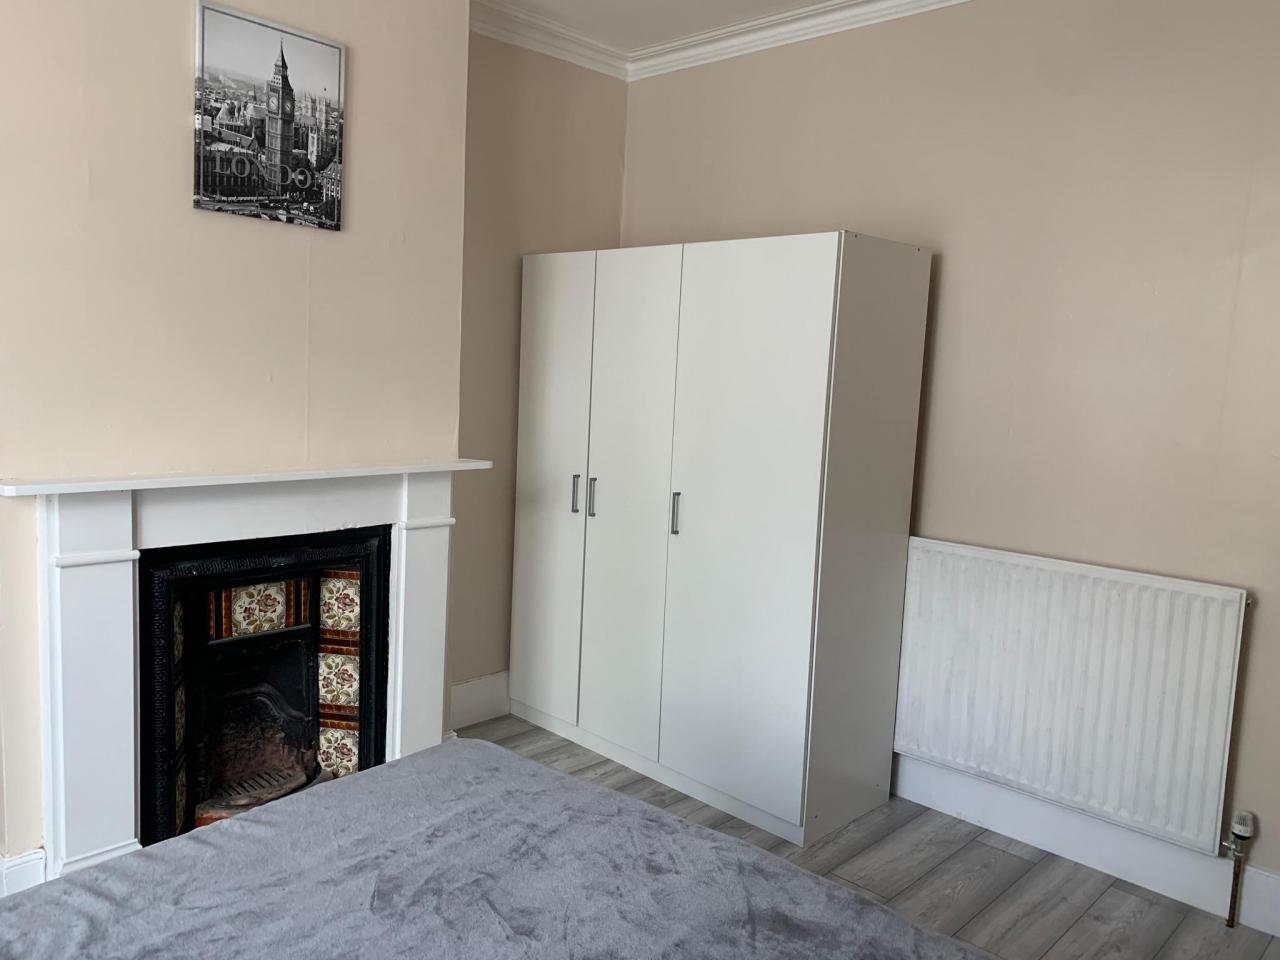 Дабл комната в районе Wanstead - 2